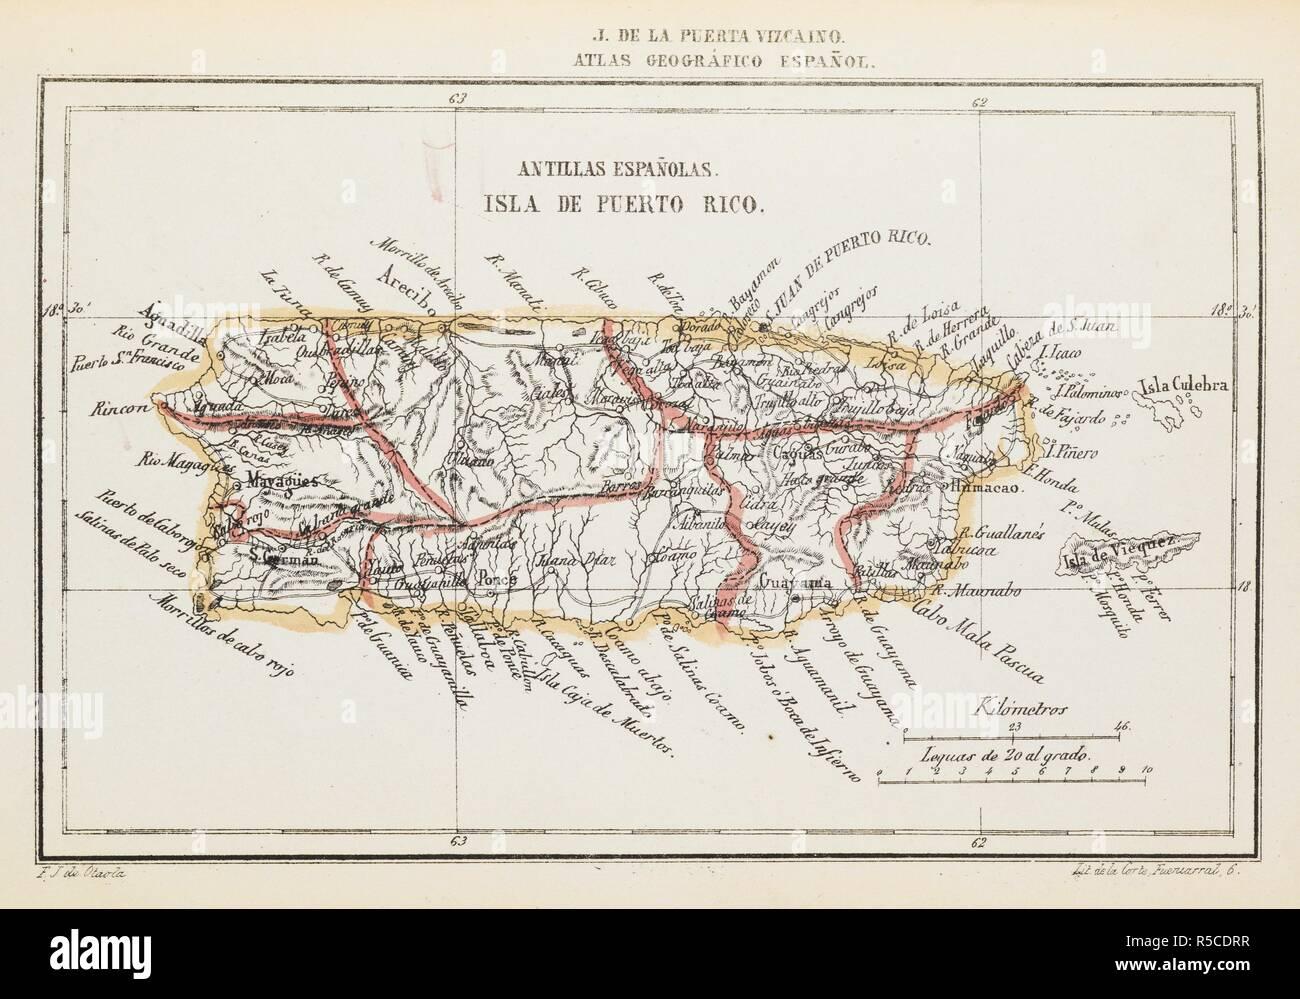 Puerto Rico Mapa Mundi.A Map Of Puerto Rico Atlas Geograi Fico Espaniƒol